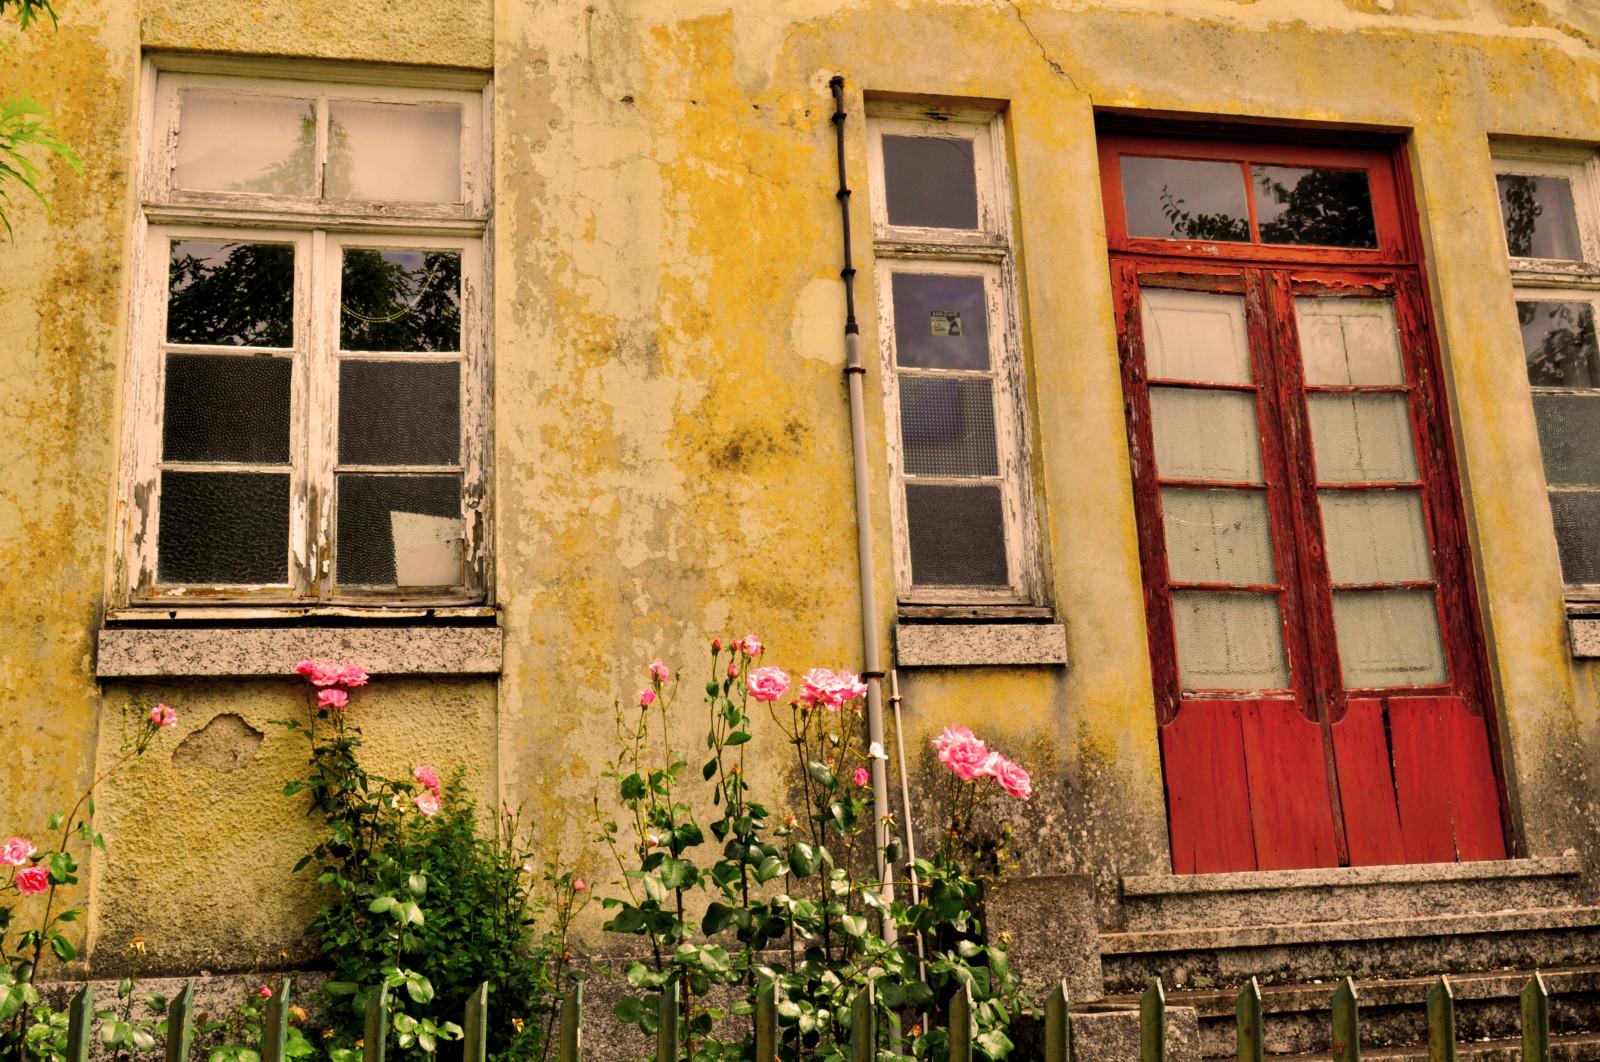 Wallpaper  Blonde, Window, Flowers, Architecture, Brunette, Red, Wall, House, Nikon -3529